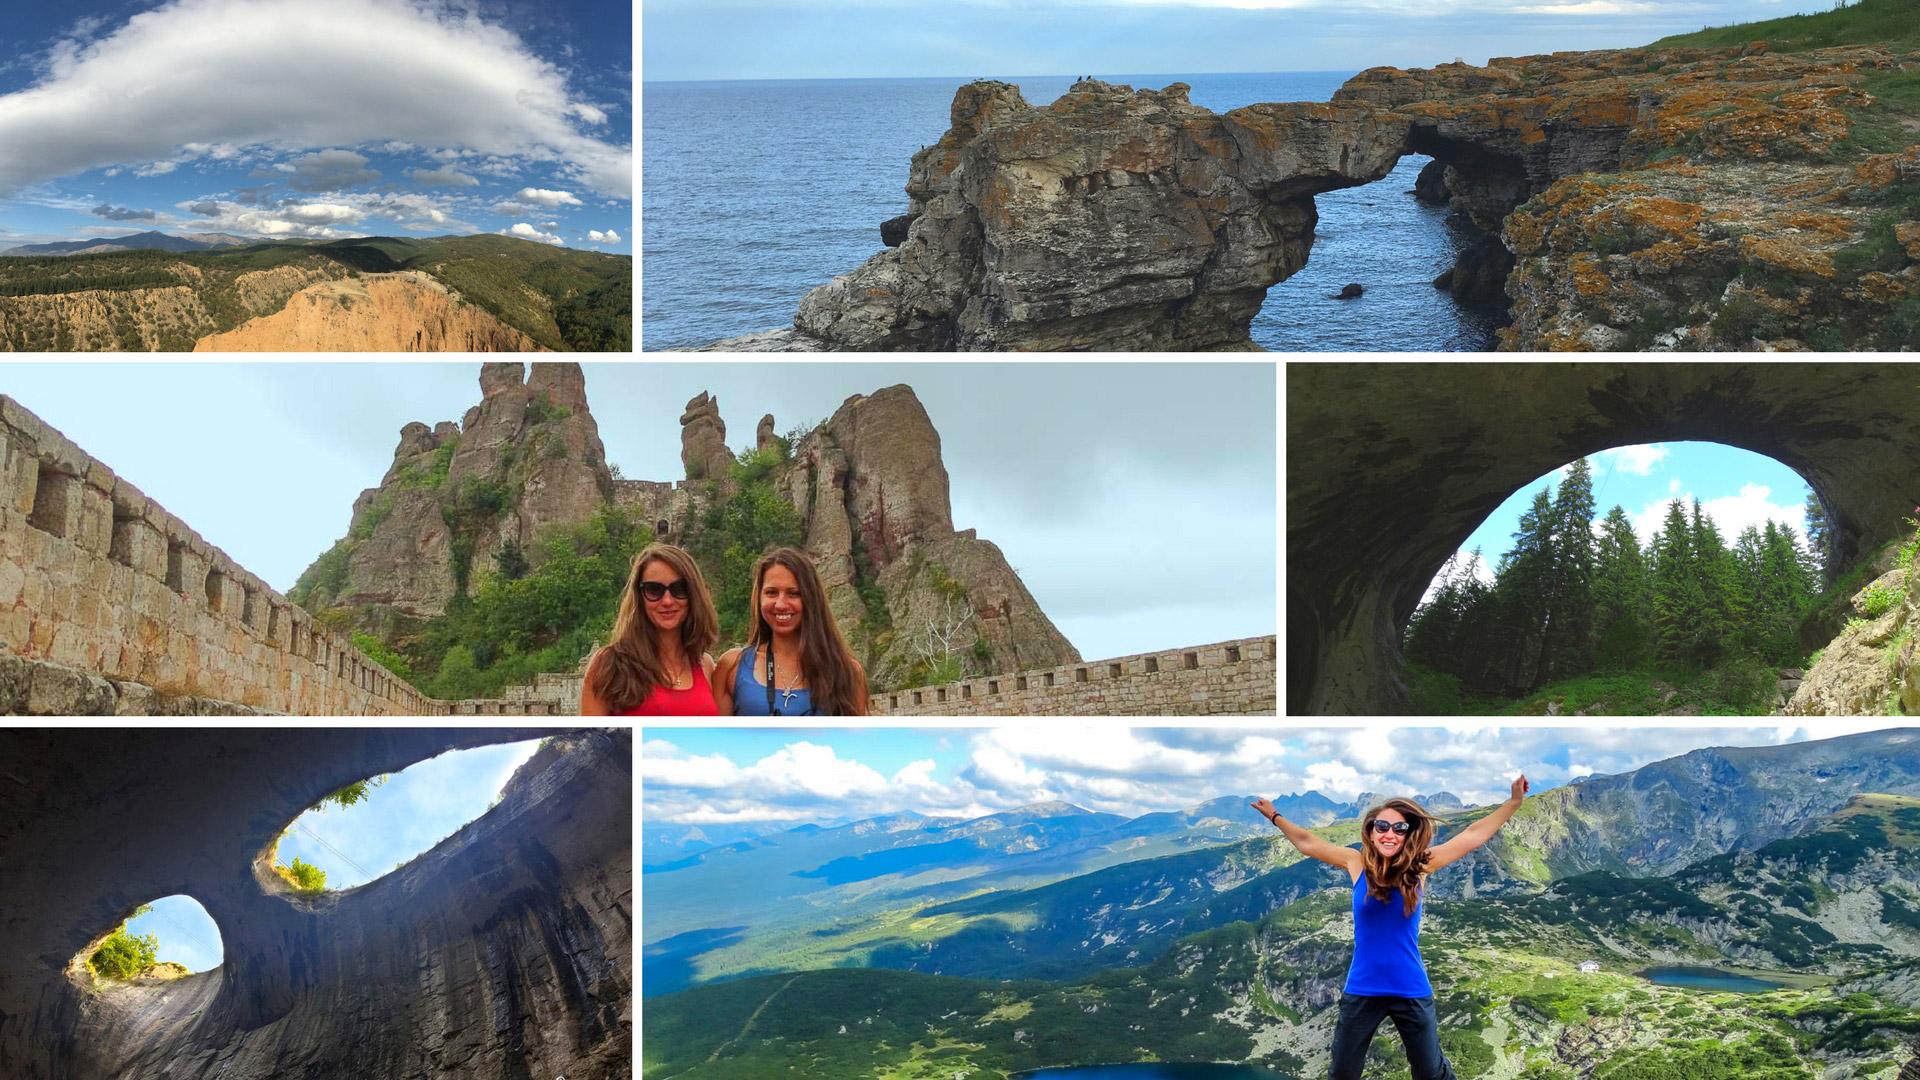 Must see natural phenomena in bulgaria